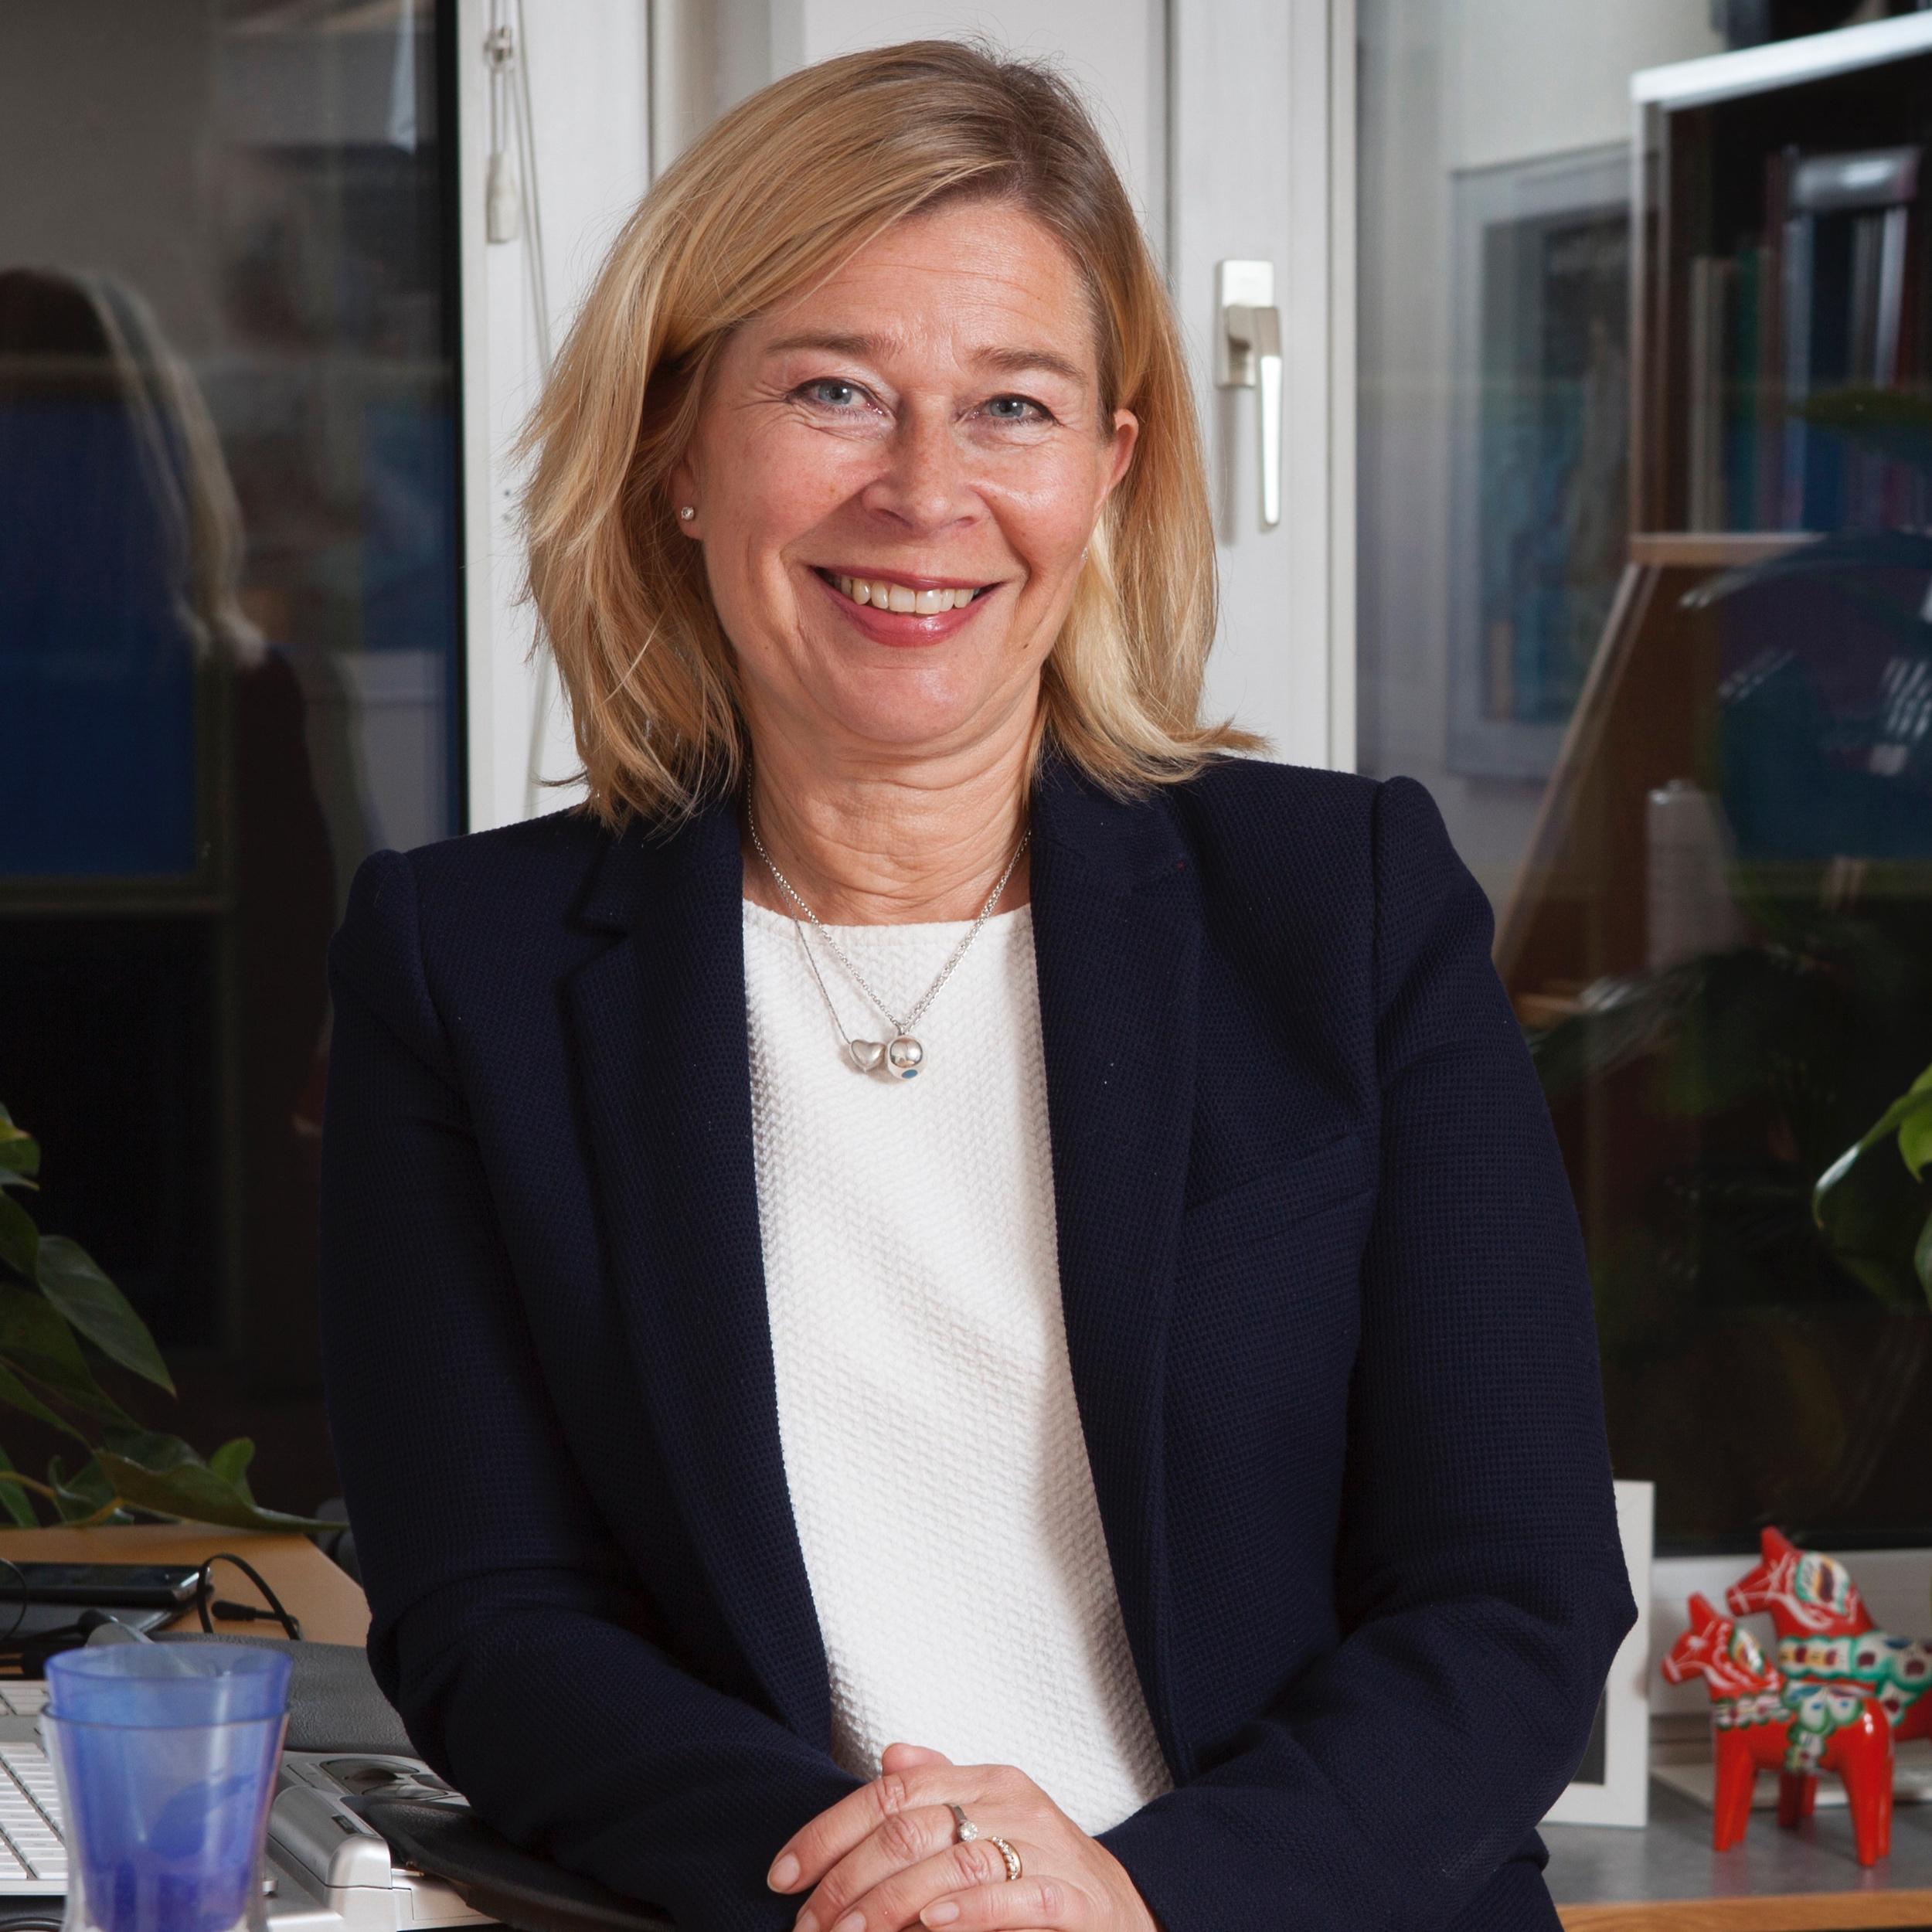 Anna-Carin Gripwall, head of communication at the Swedish Waste Management Association (Avfall Sverige). Photo: Avfall Sverige